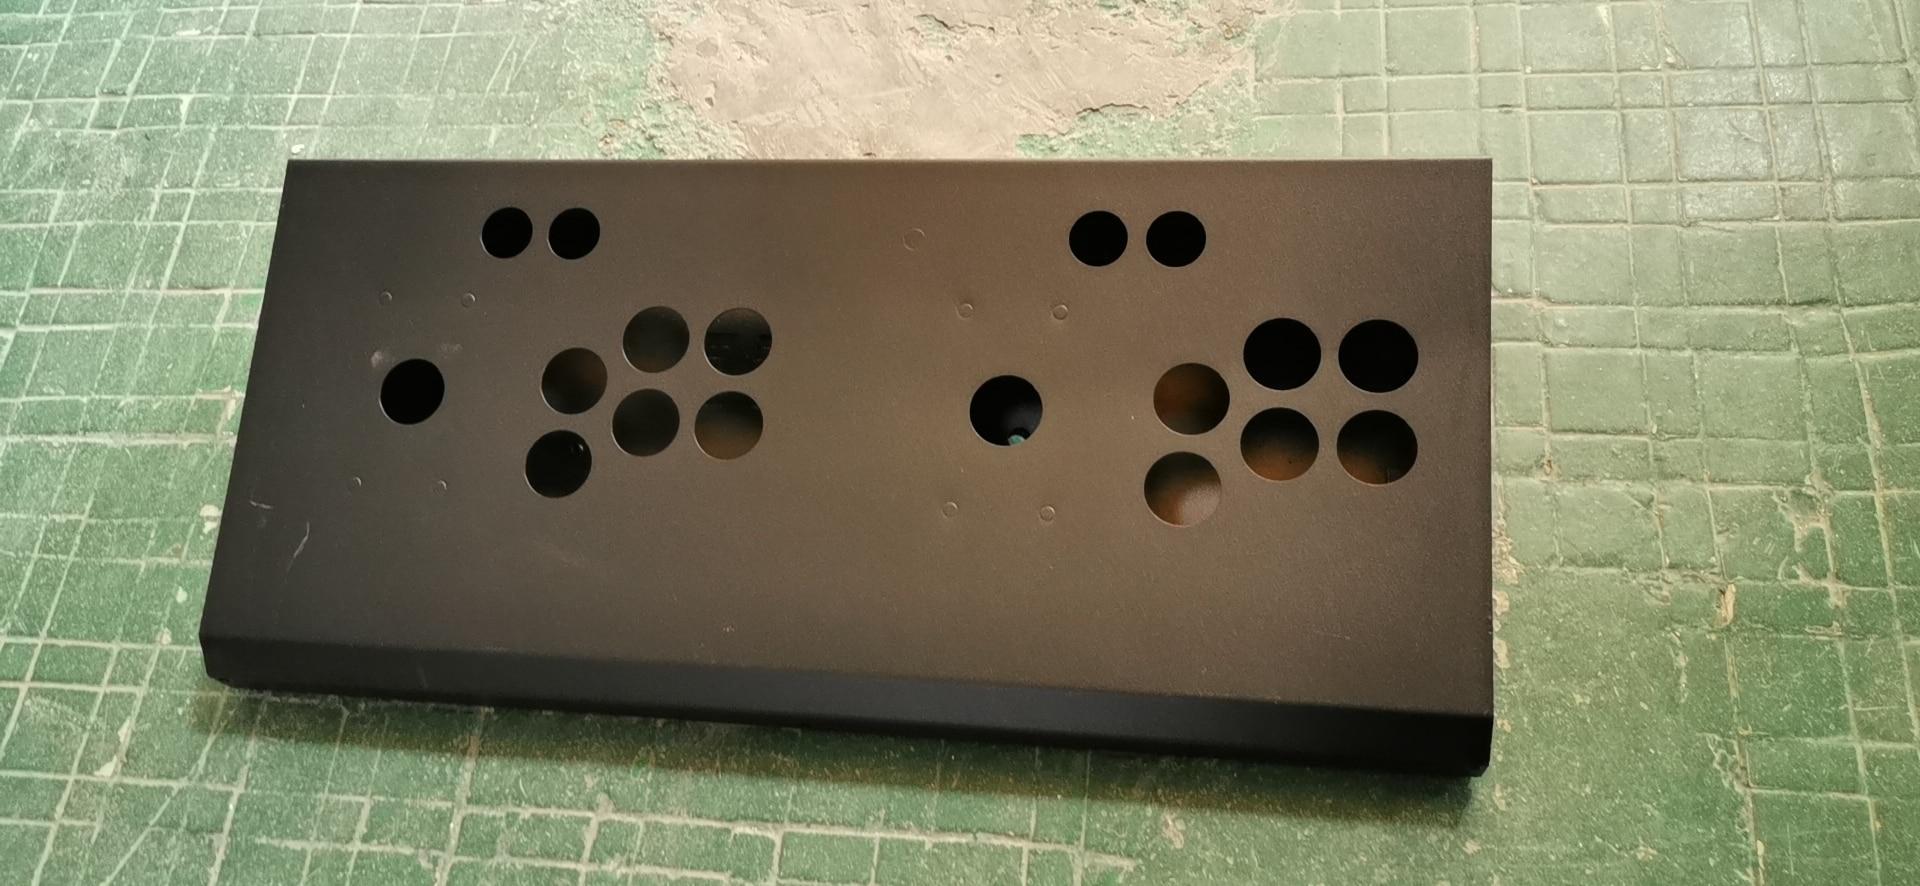 Pandora Box Kit DIY Gaming Machine Panel Box May Be Mounted 30mm 24mm 28mm 33 Mm Arcade Button